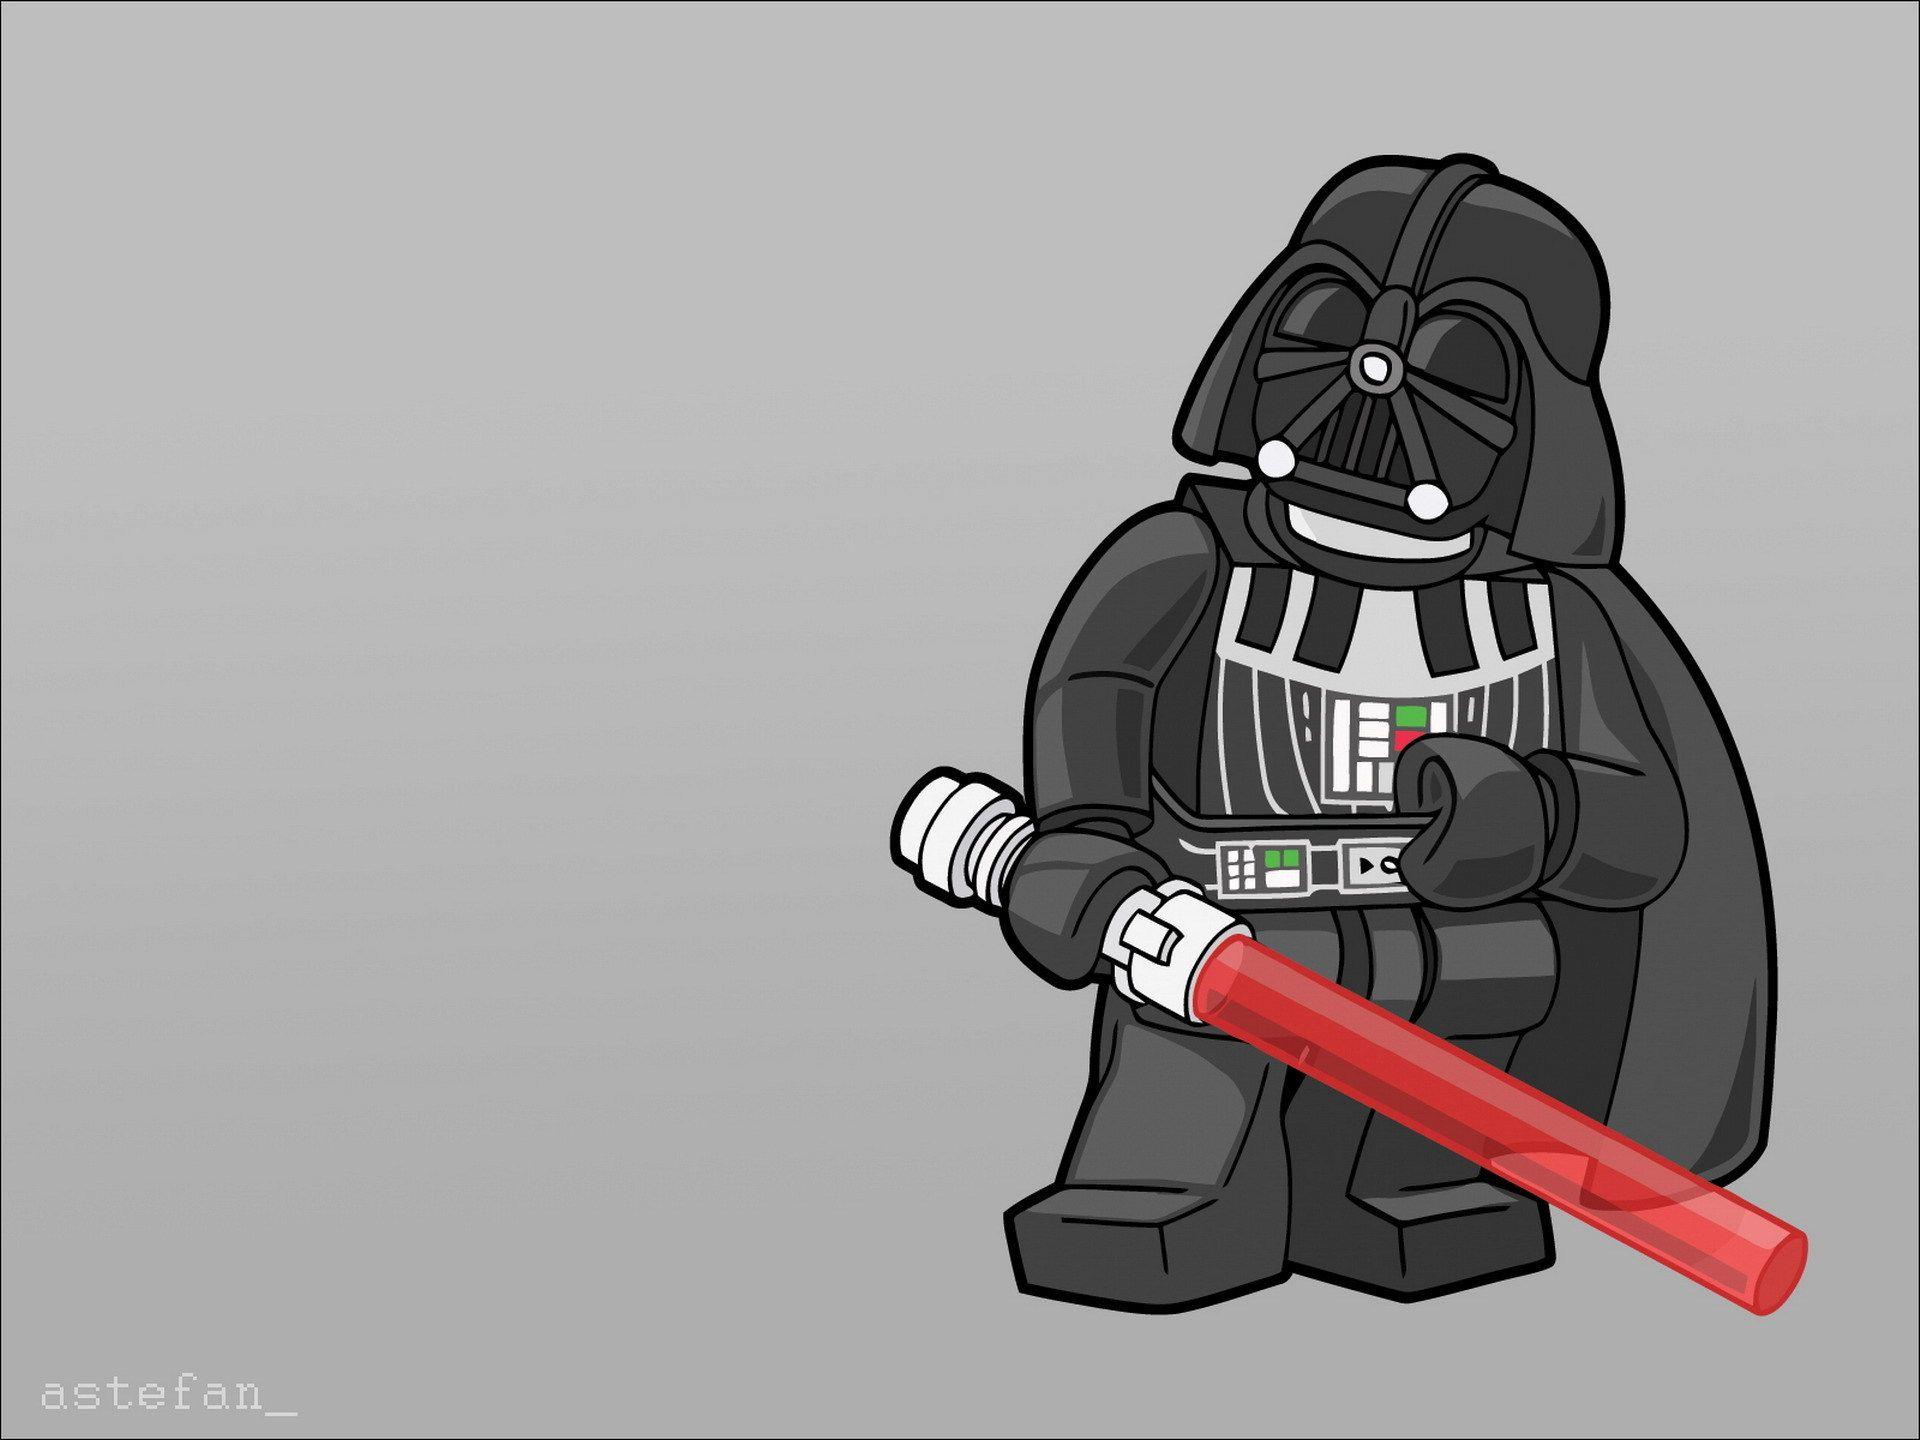 Star Warriors, Darth Vader - Lego Star Wars Wallpaper Darth Vader Hd , HD Wallpaper & Backgrounds